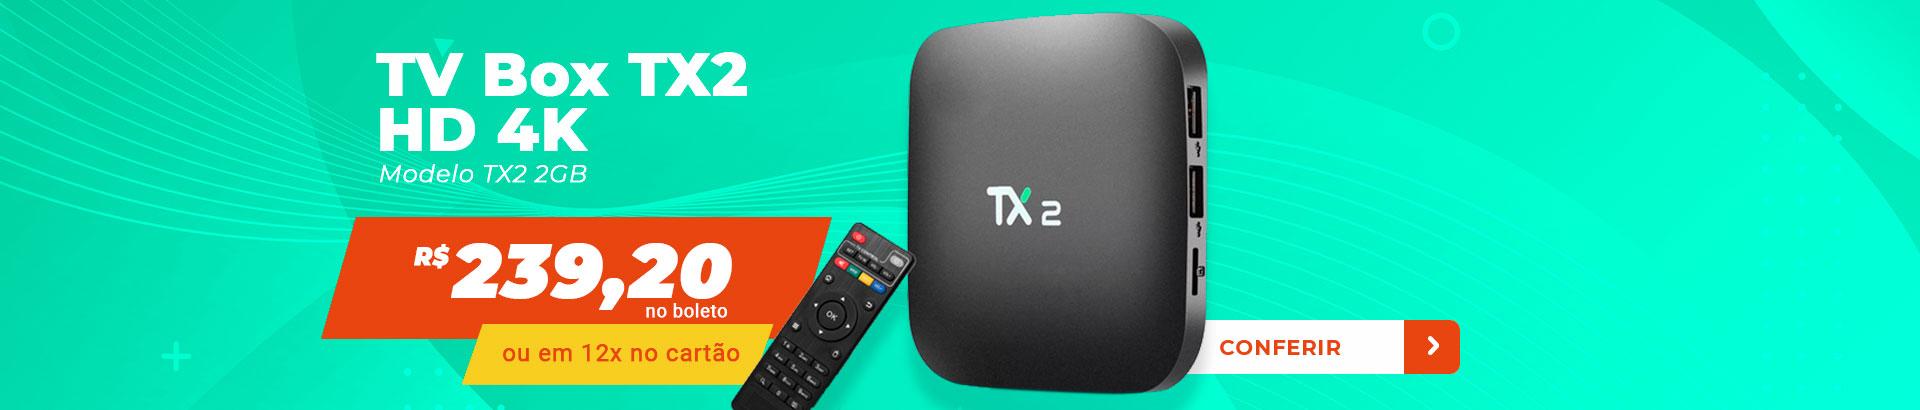 banner tv box tx2